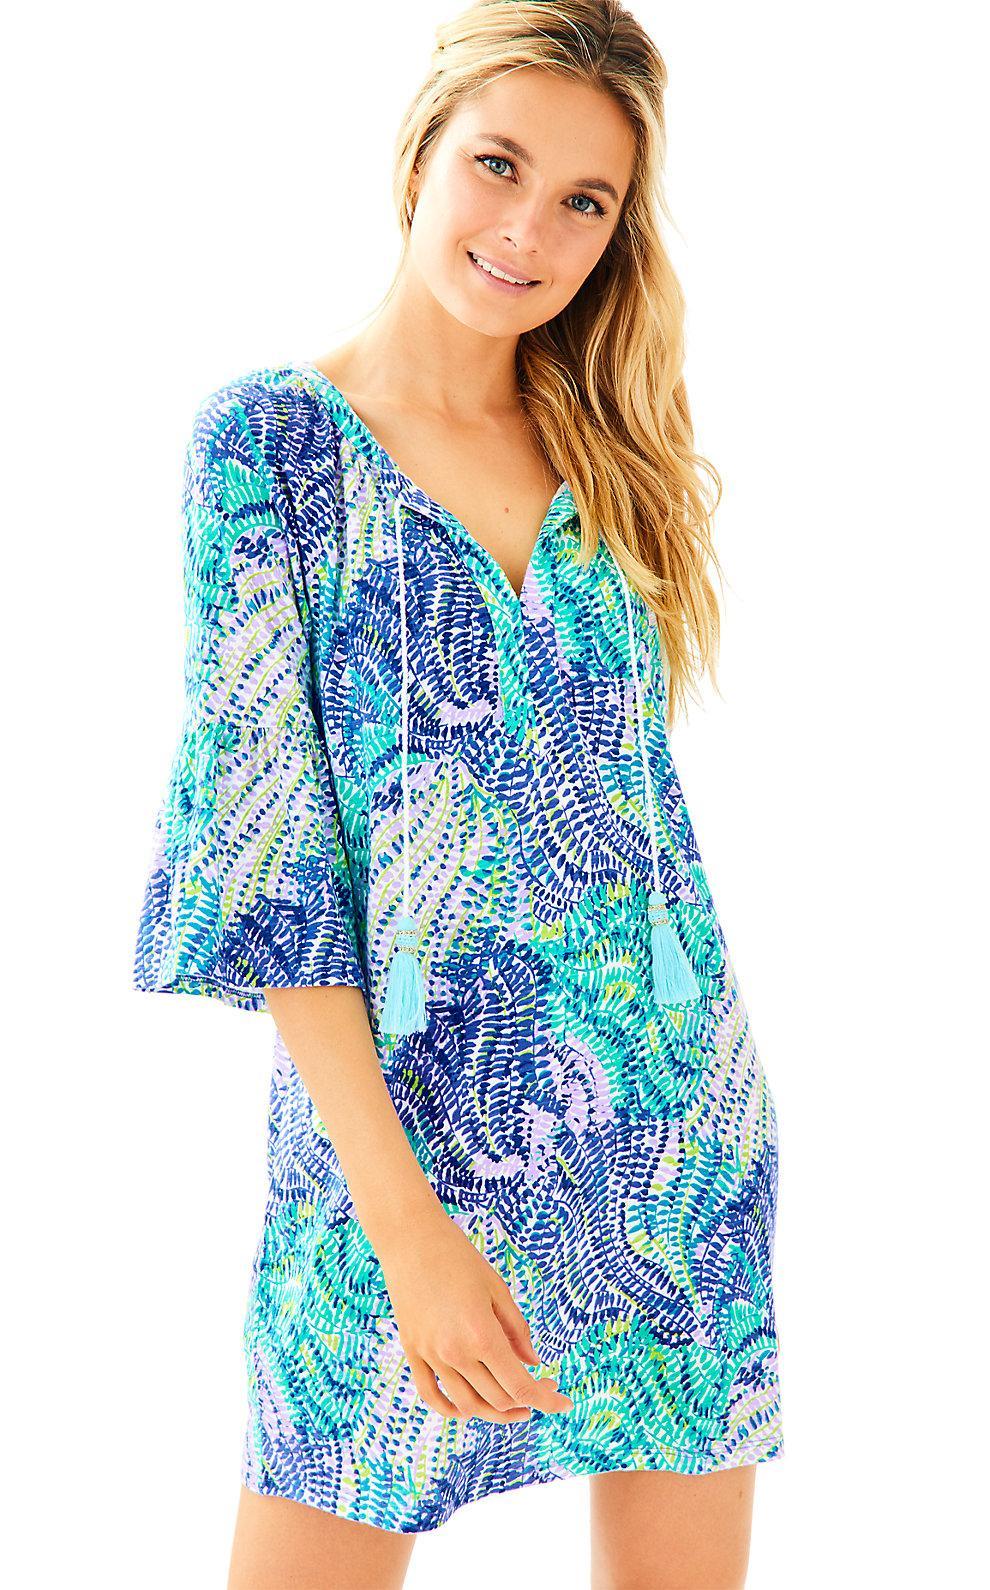 560f8efd83b Lilly Pulitzer Del Lago Tunic Dress In Blue Current Fantasea